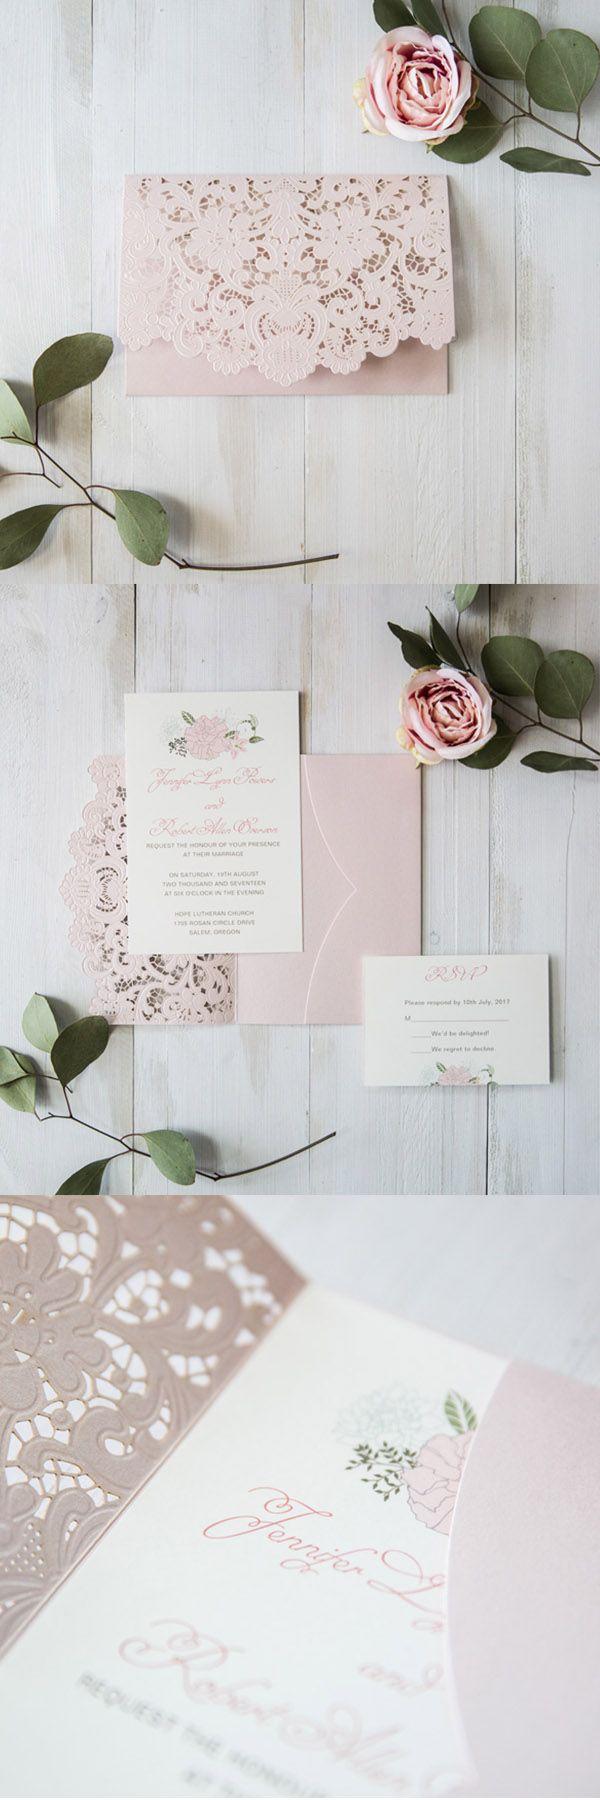 elegant blush pink floral laser cut wedding invitation cards#elegantweddinginvites#blush#elegant#garden#weddingcolors#invitations